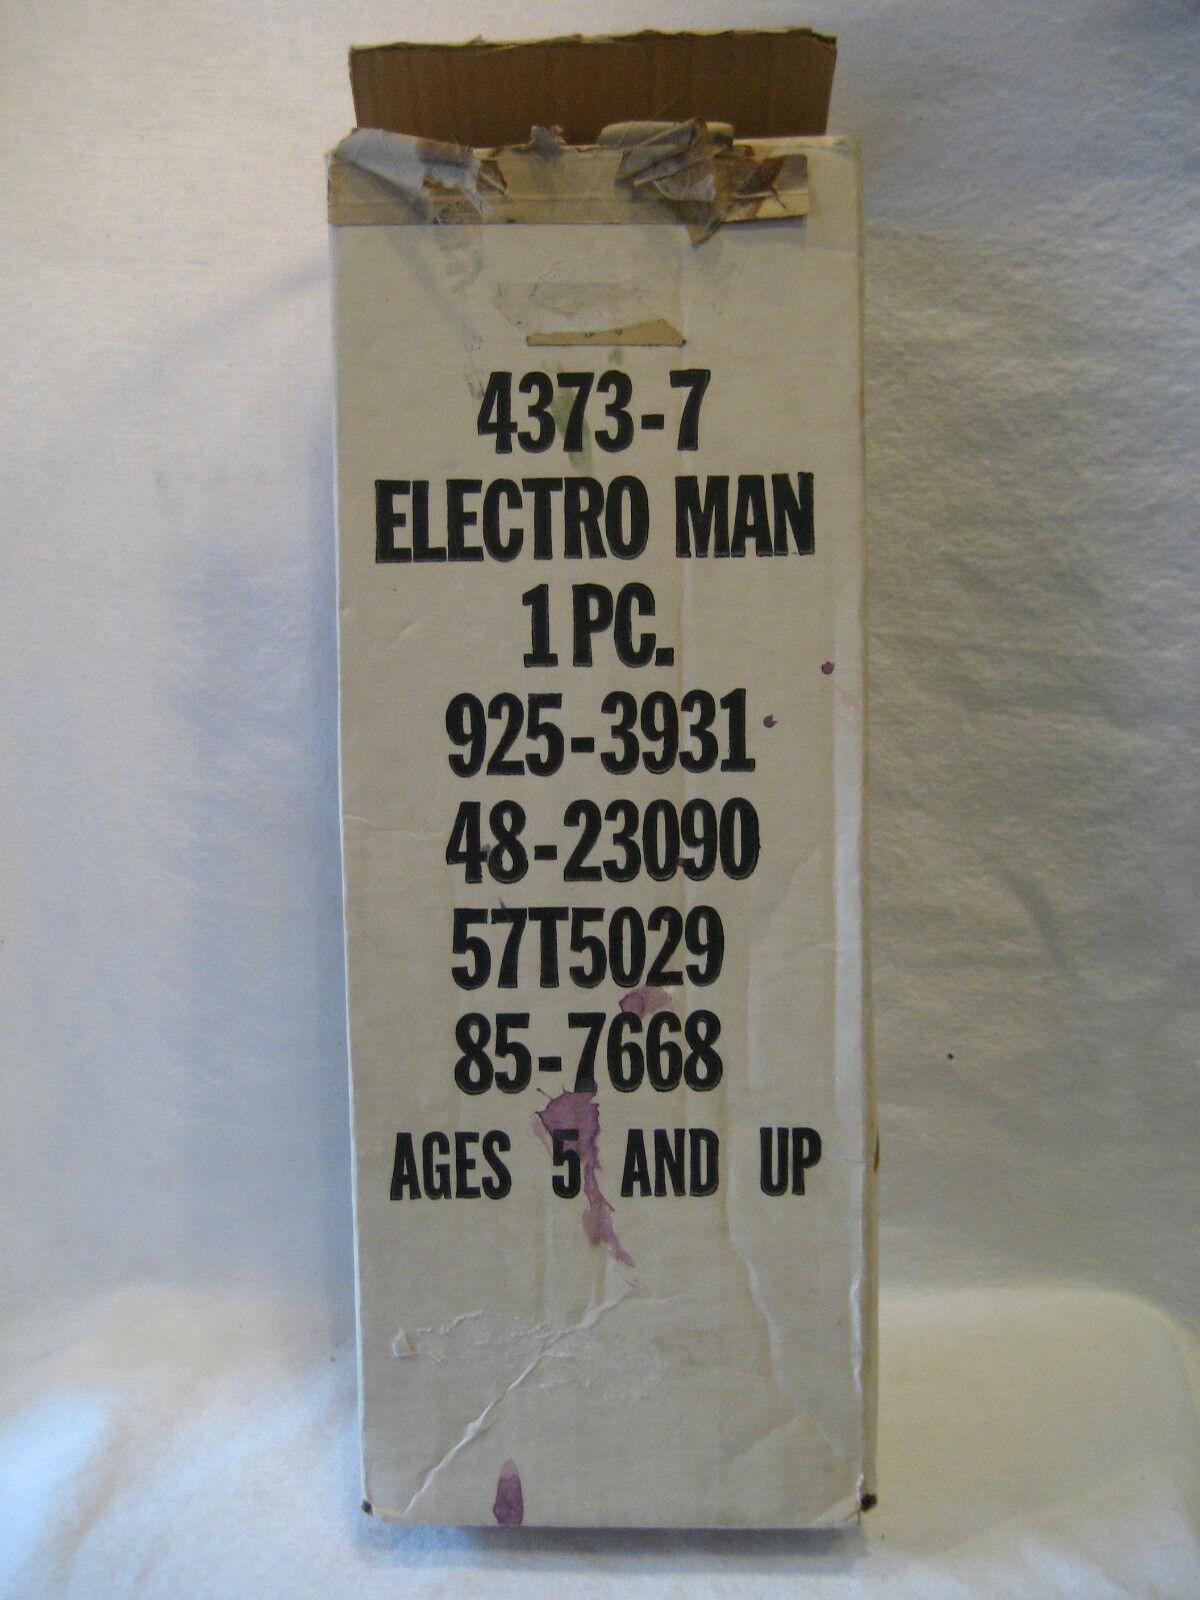 1977 vintage Ideal ELECTROMAN doll 16  Electro-Man figure figure figure toy w RARE mailer BOX c70791